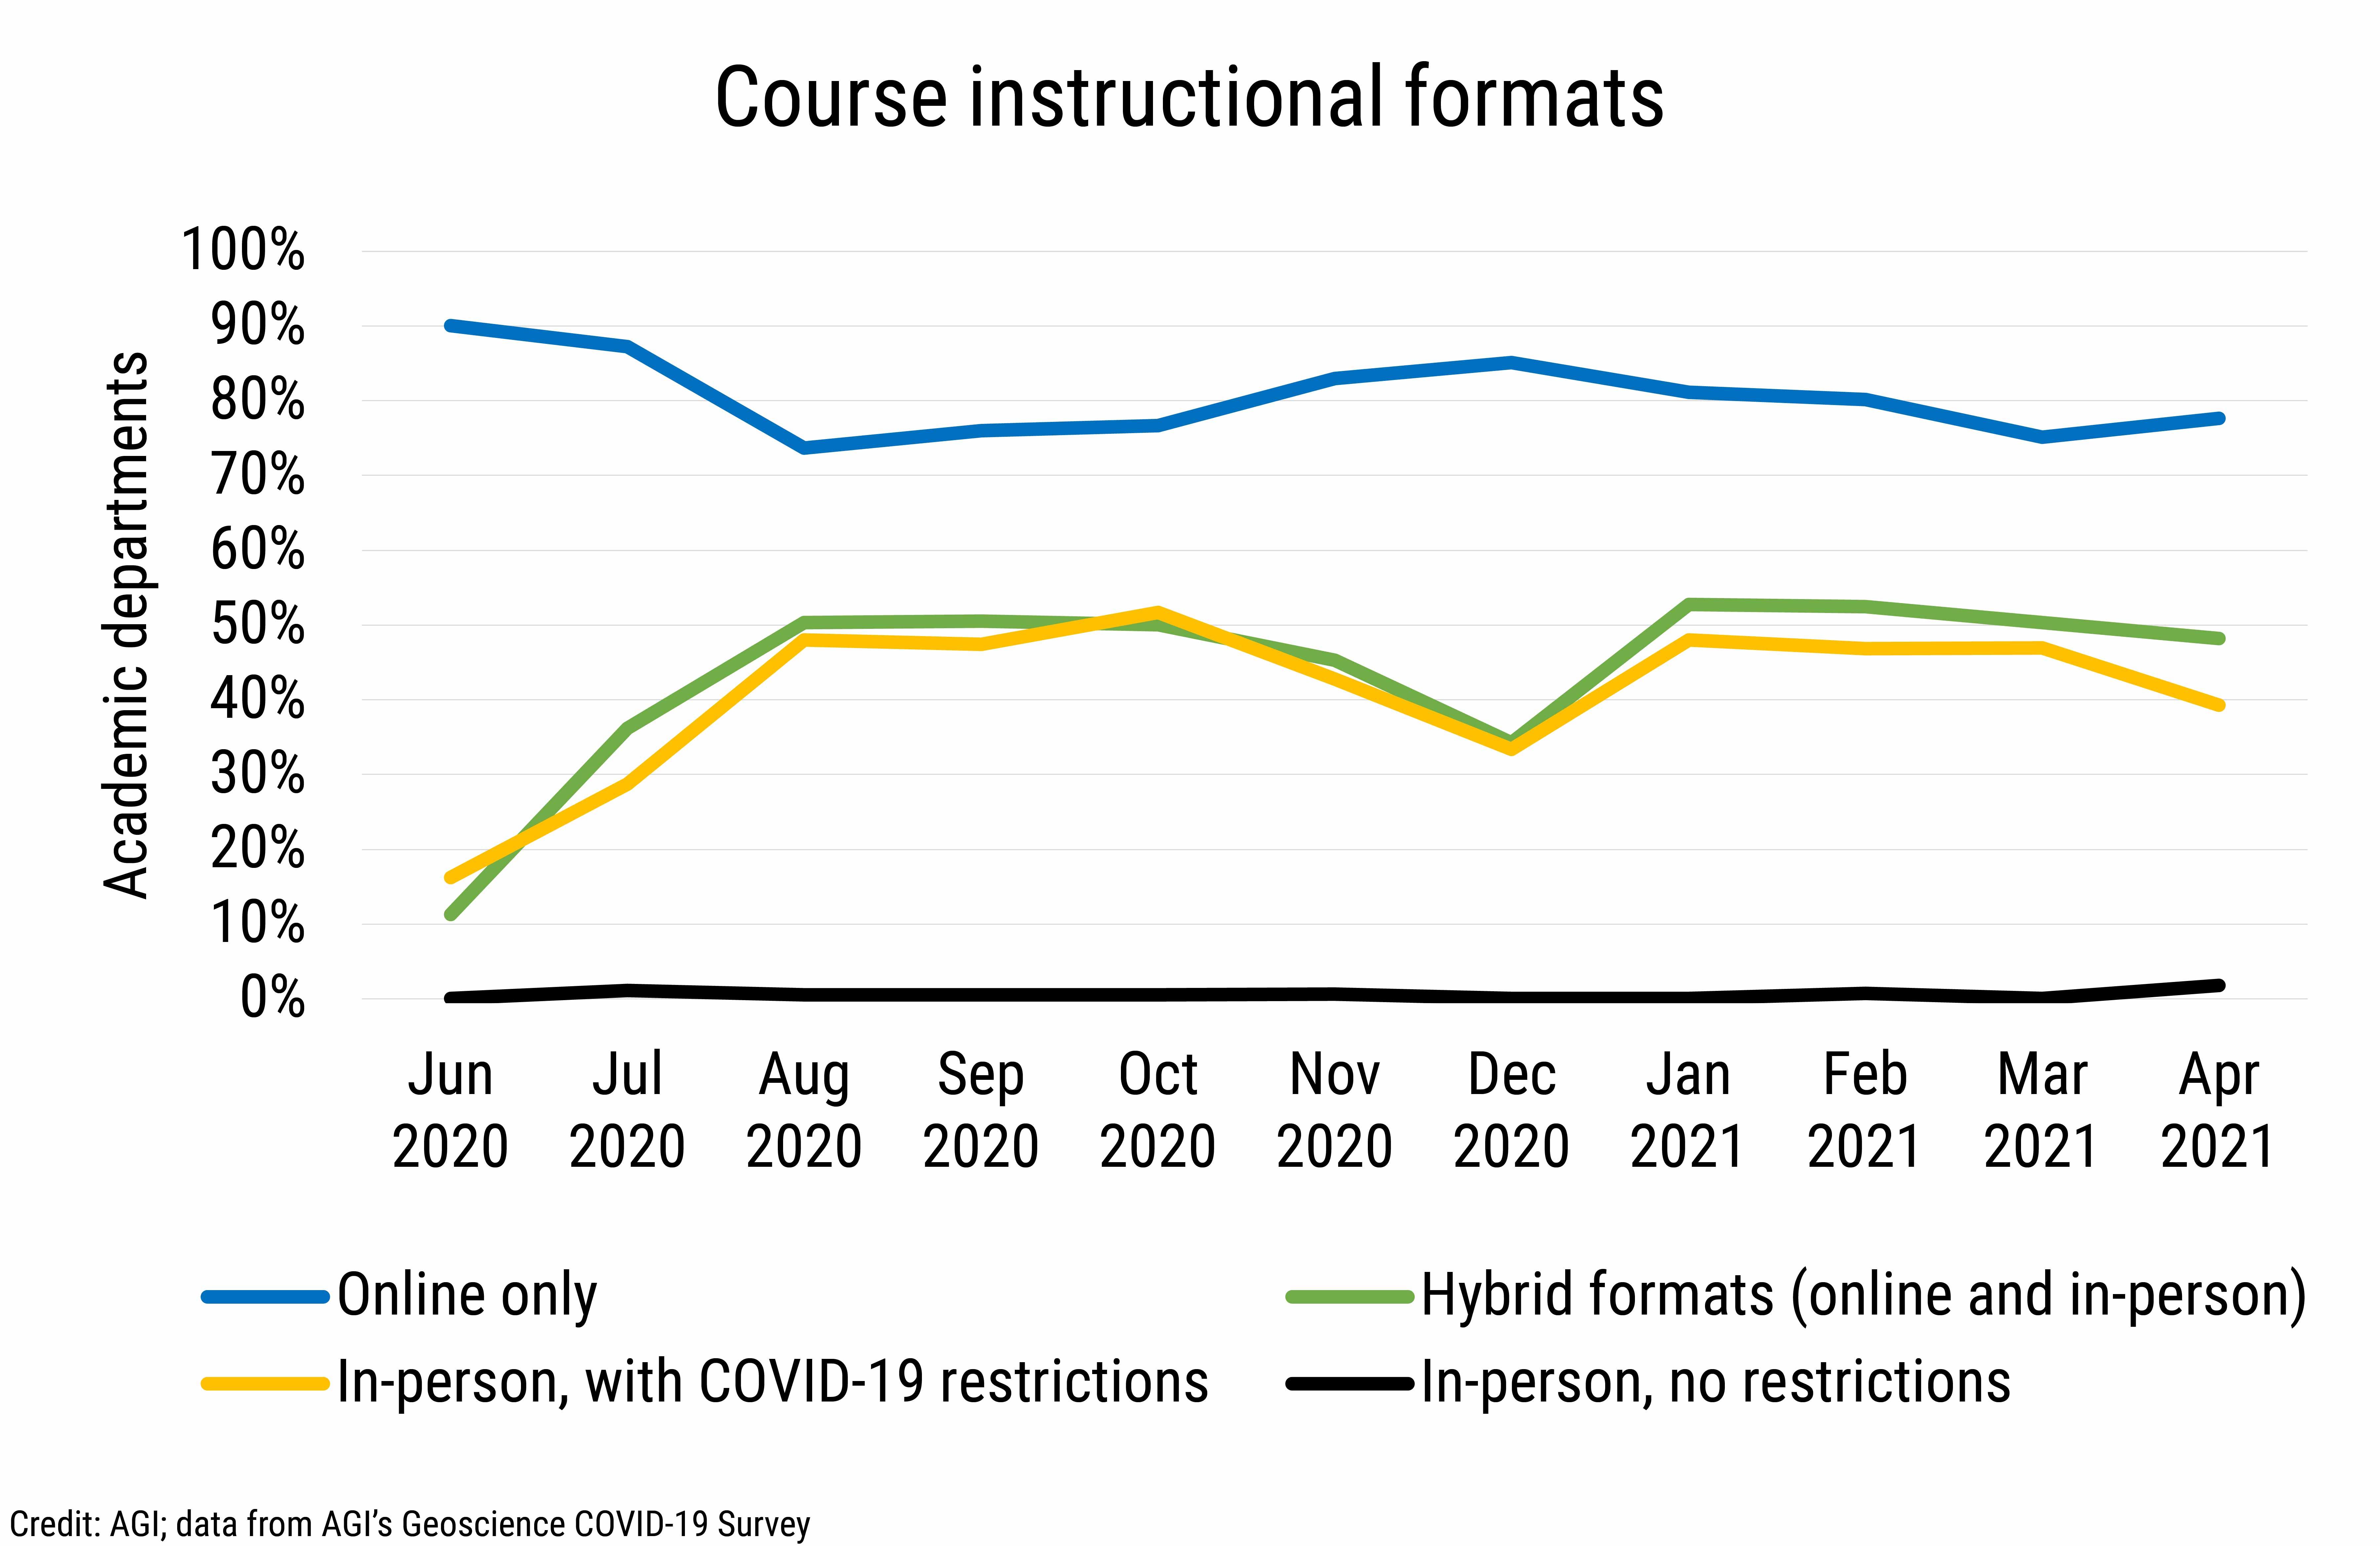 DB_2021-016 chart 01: Course instructional formats (Credit: AGI; data from AGI's Geoscience COVID-19 Survey)